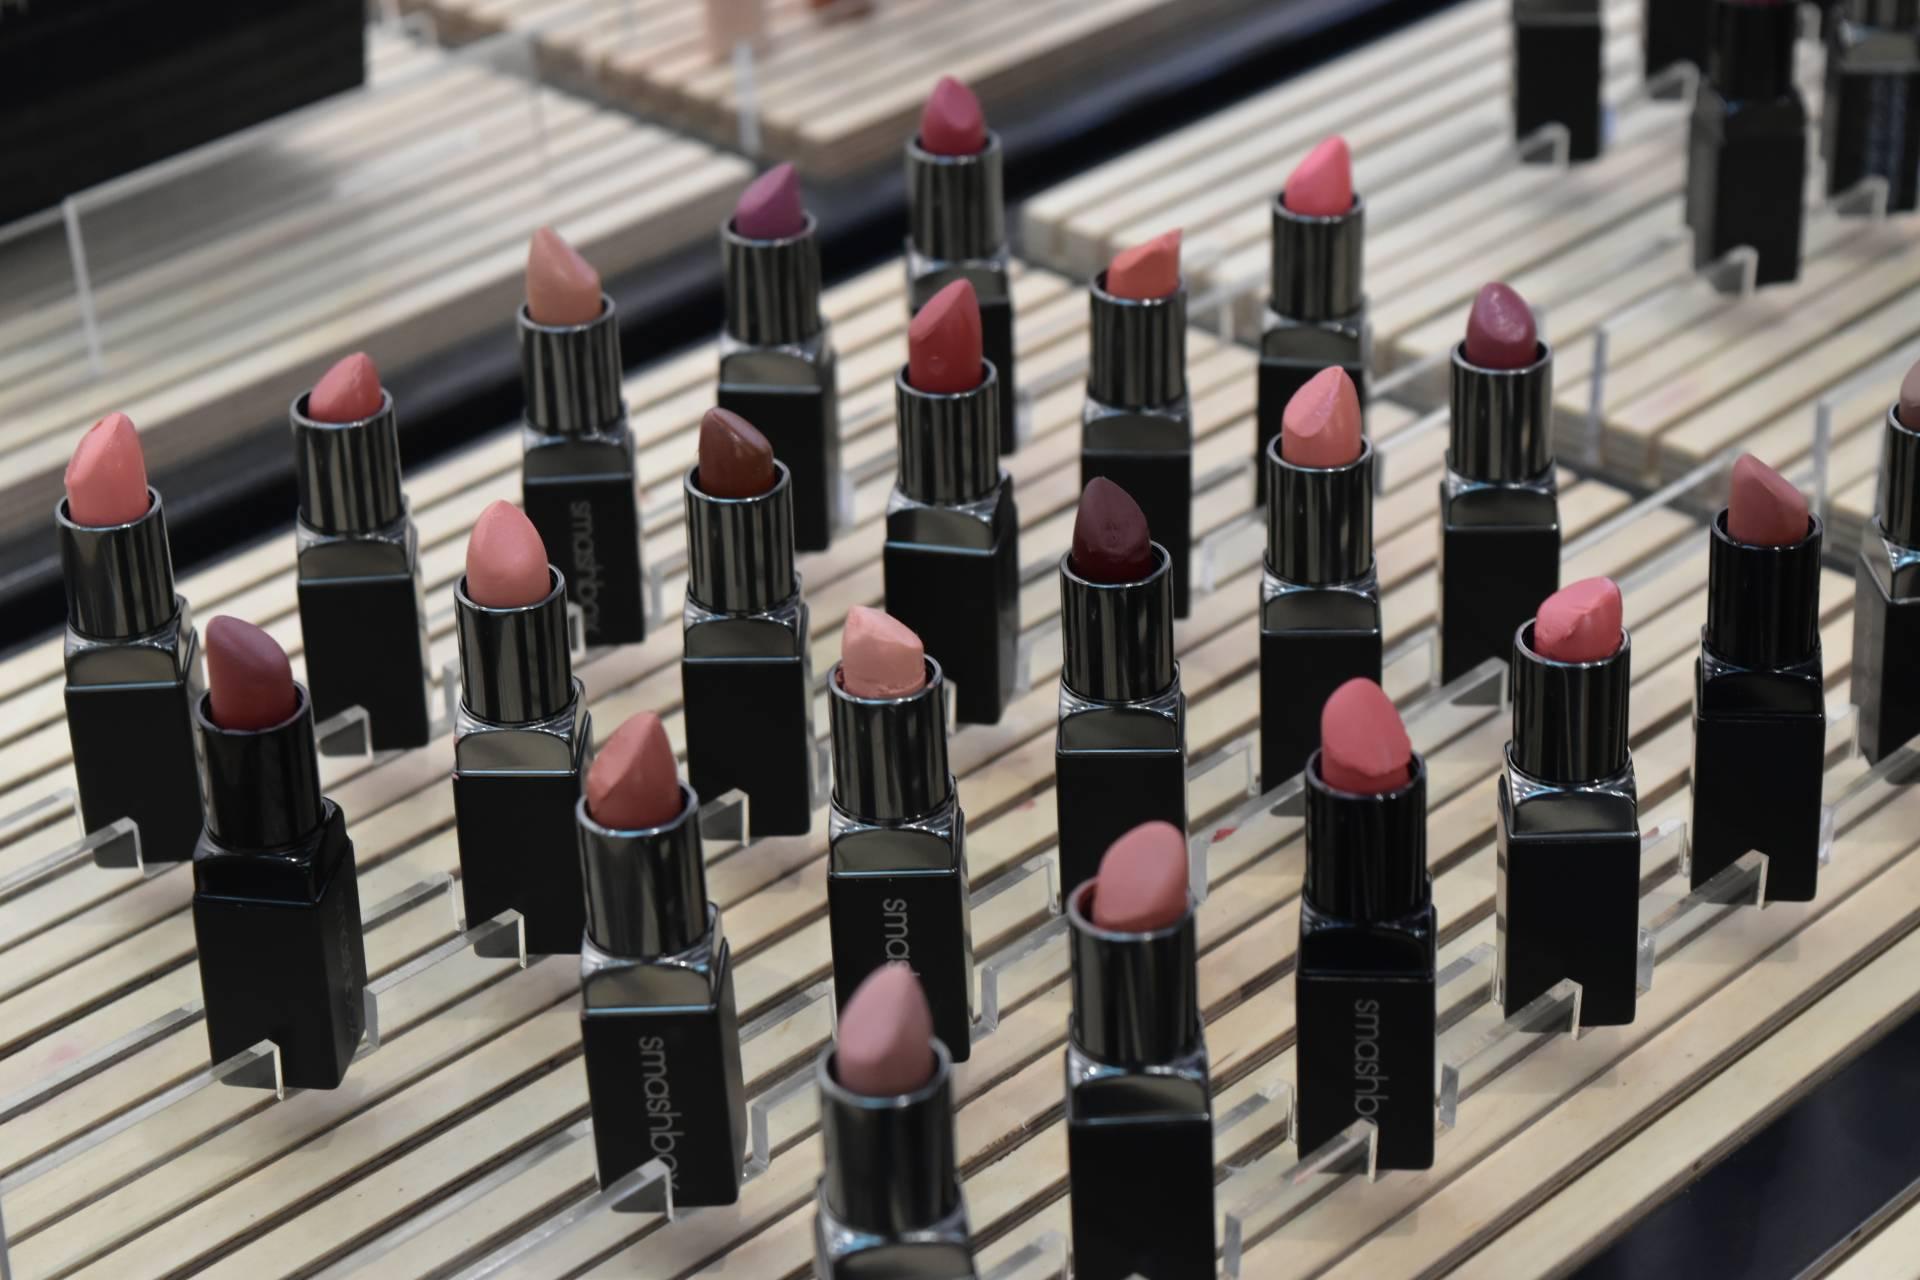 Be Legendary 120 lipsticks